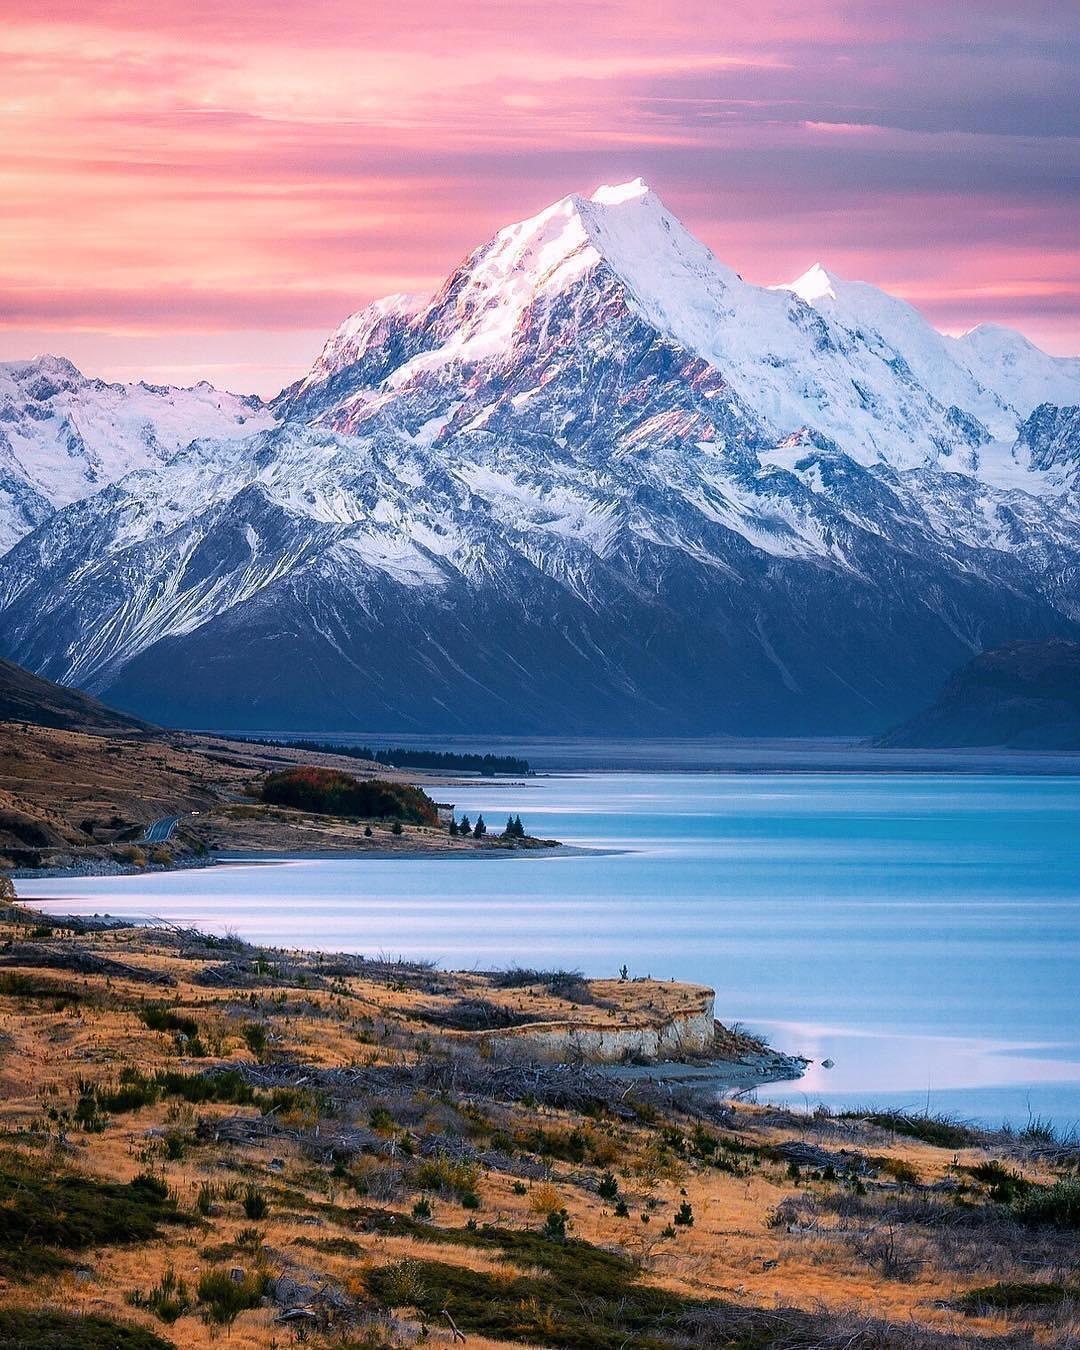 Aoraki Mount Cook New Zealand Mostbeautiful Fine Art Landscape Photography Fine Art Landscape Landscape Photography